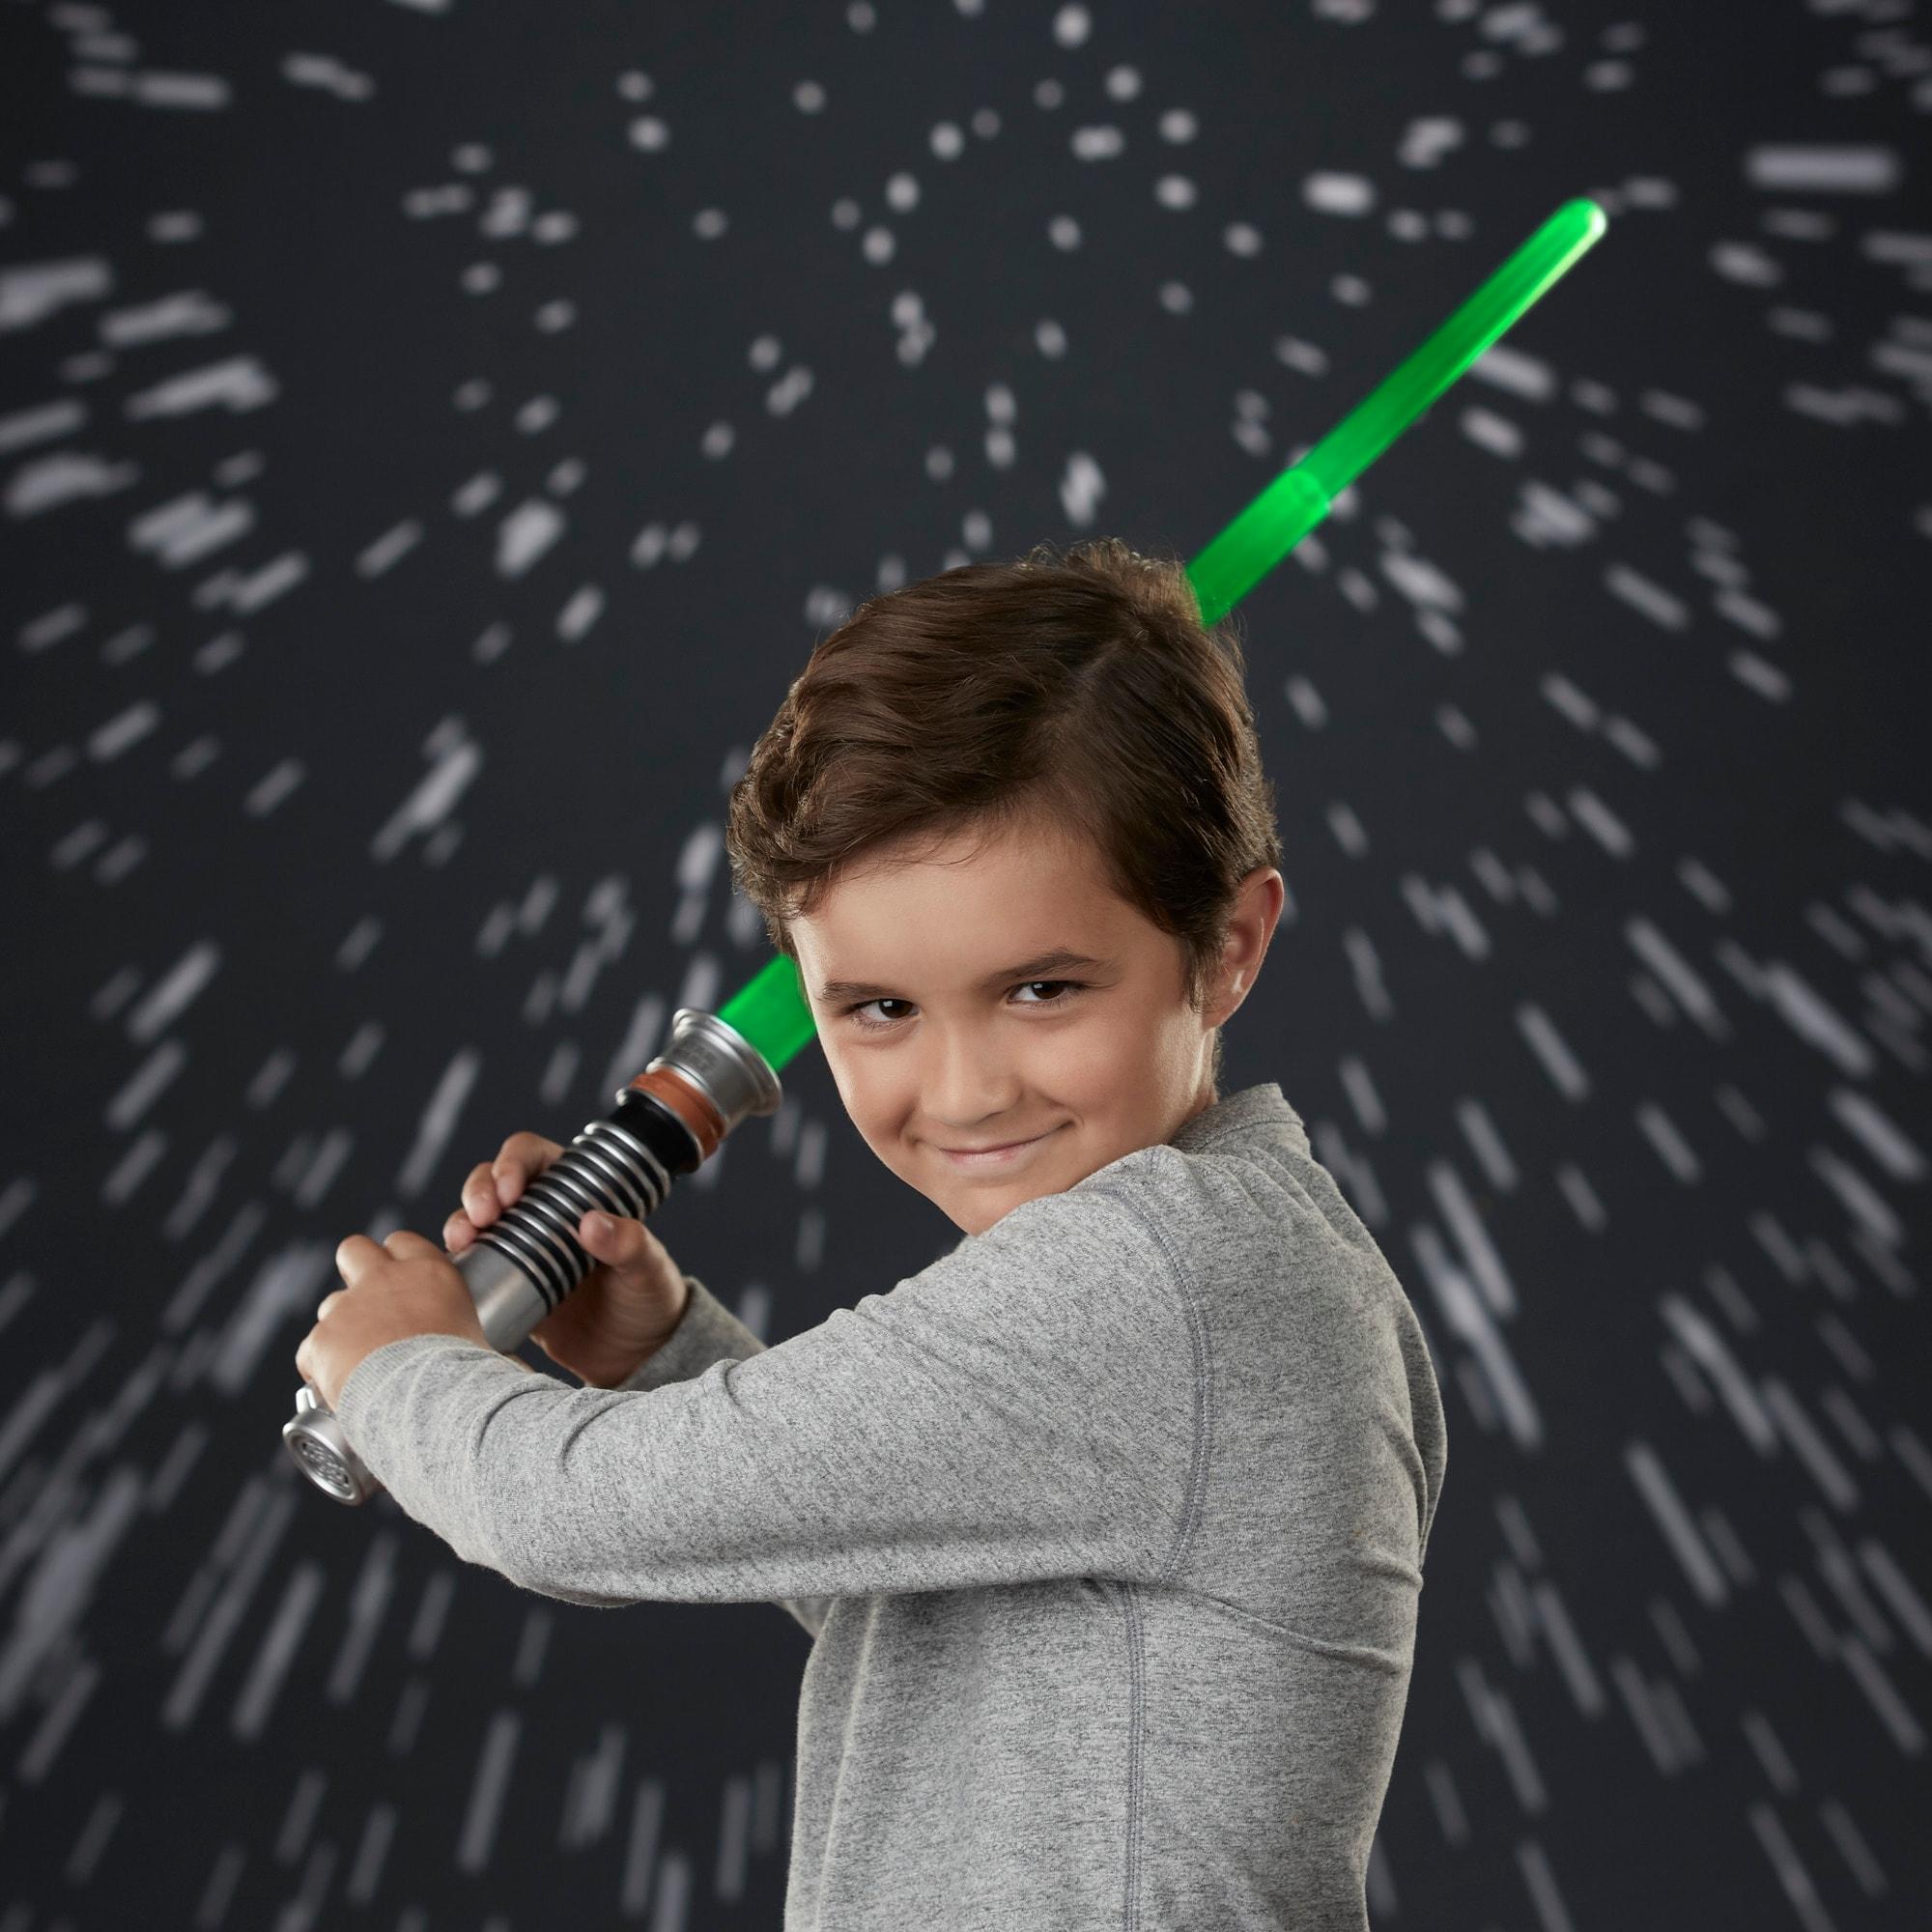 Shop Star Wars Luke Skywalker Electronic Green Lightsaber Toy Overstock 30346091